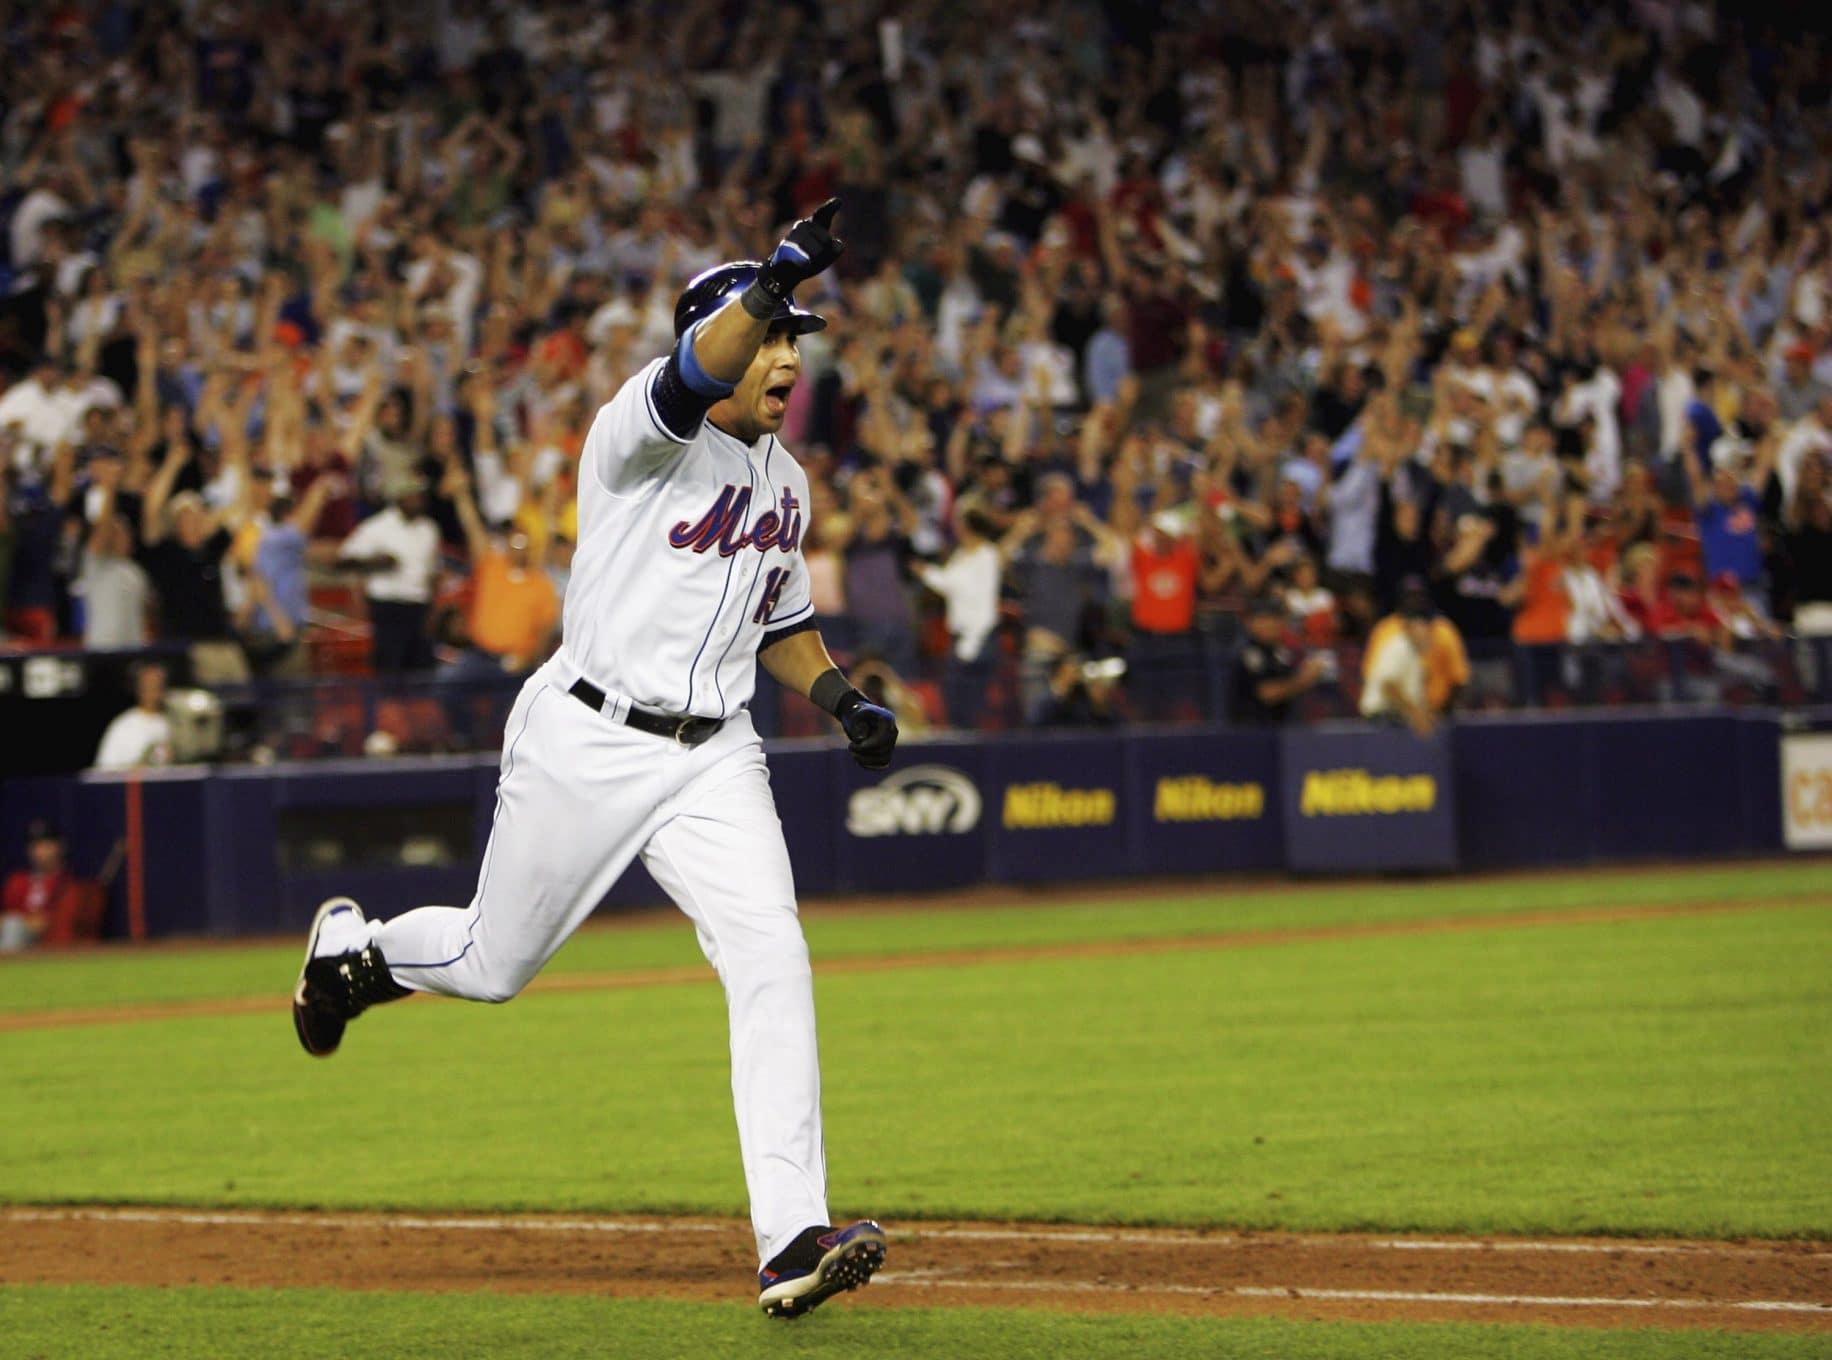 New York Mets 2006 Caught Looking: The Unfair Criticism of Carlos Beltran 2